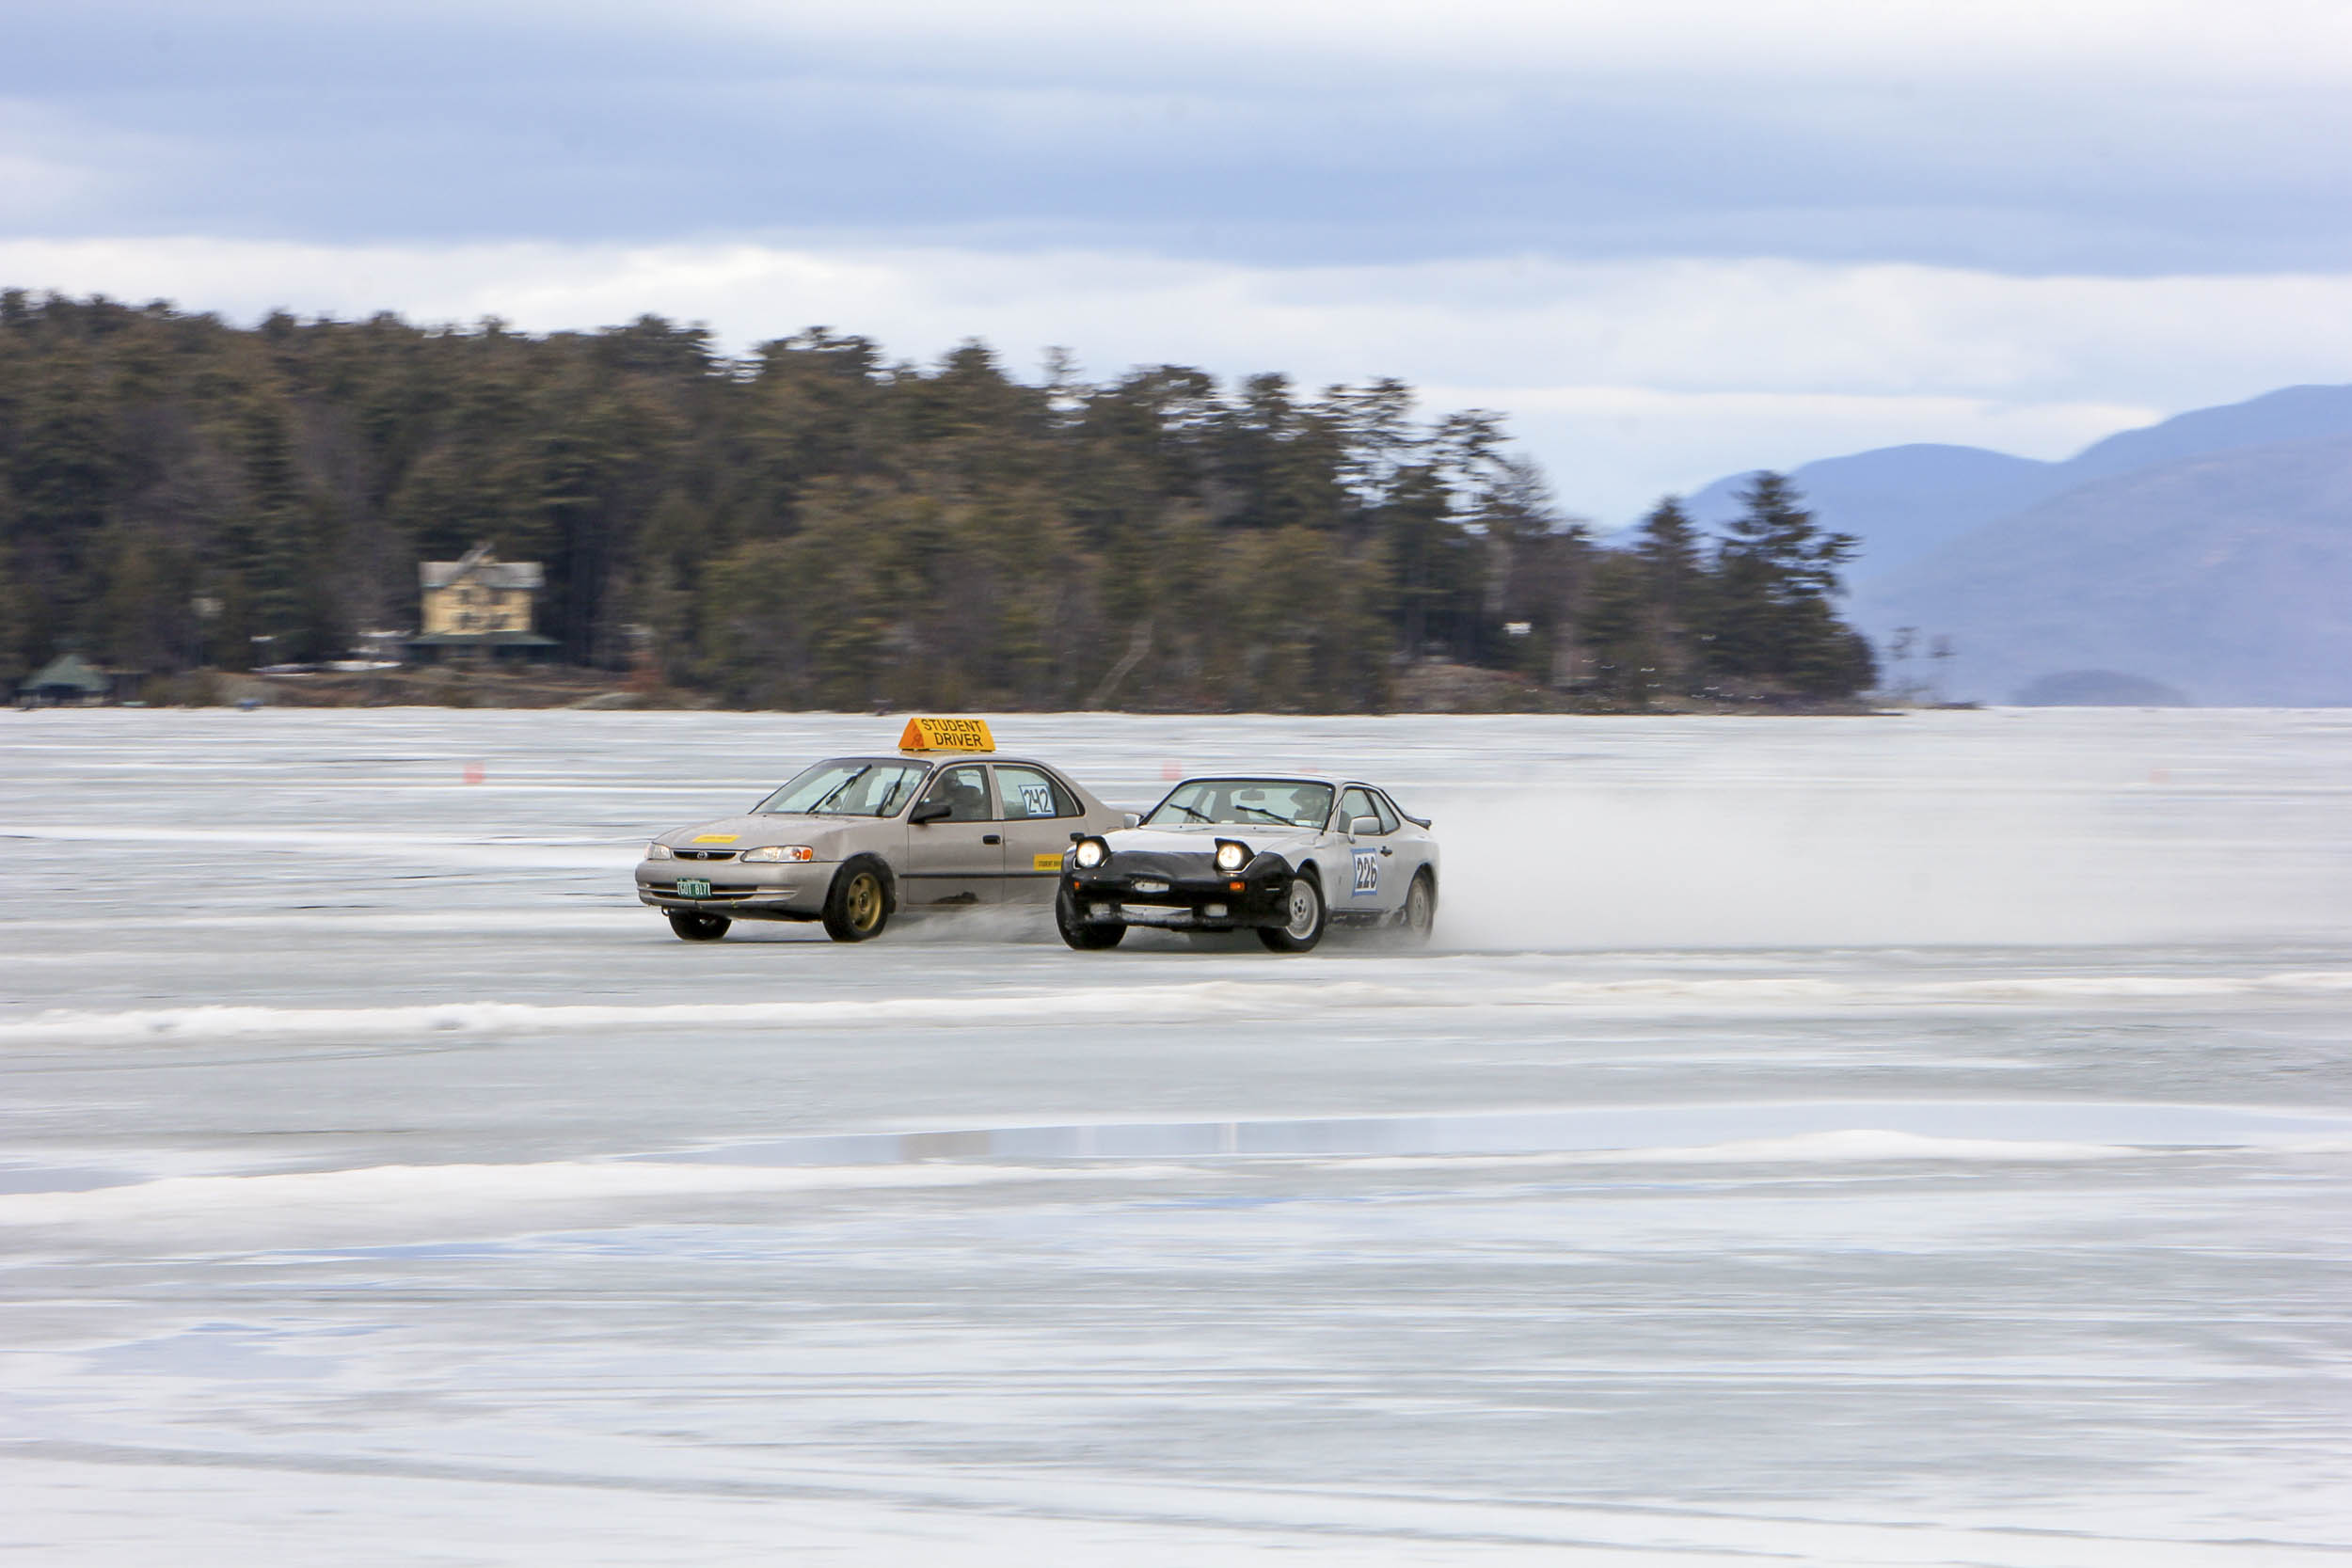 ice drifting